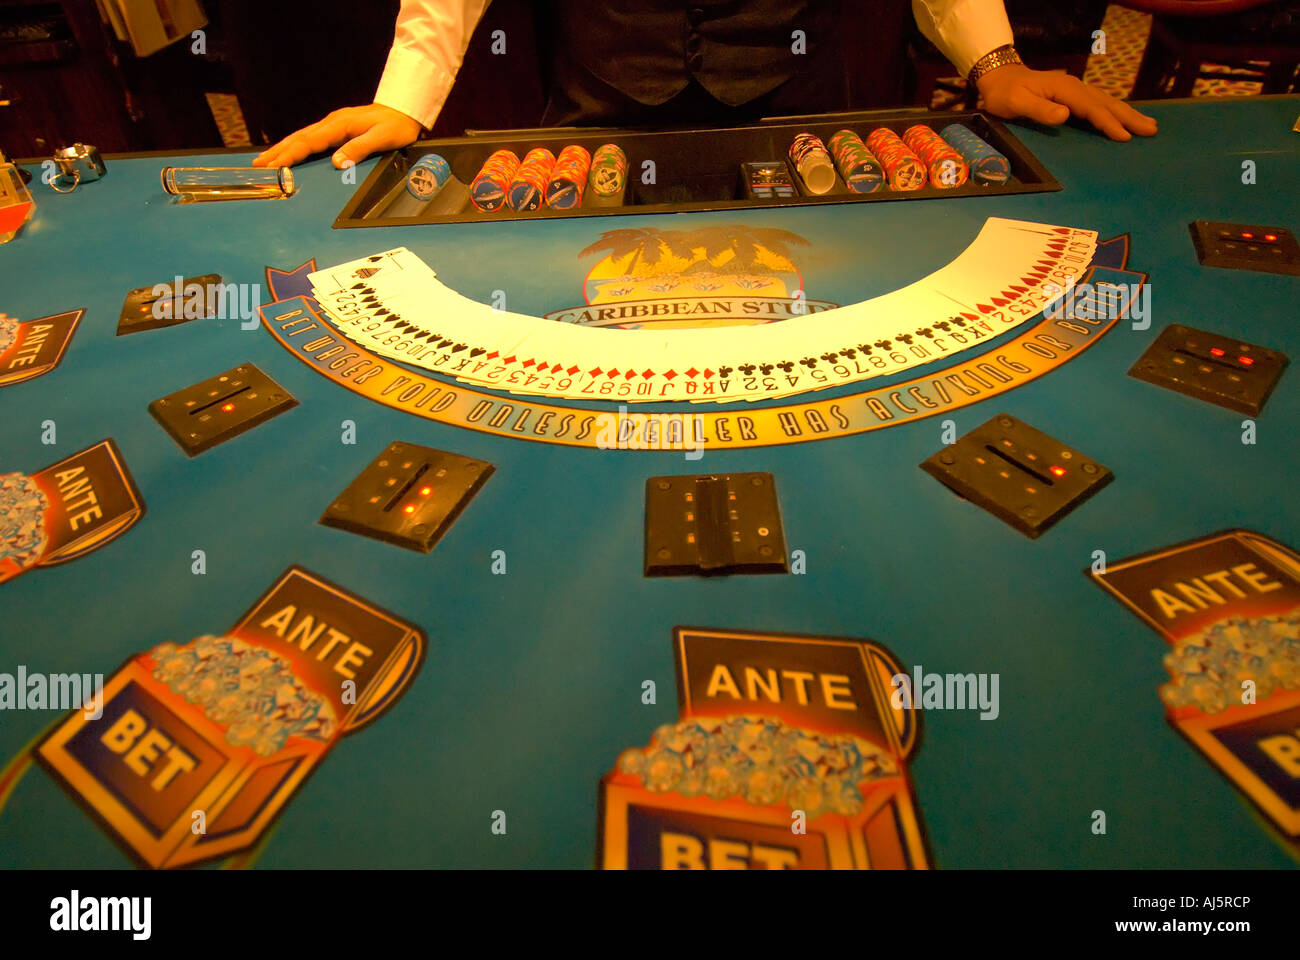 Casino Caribbean stud poker casino gambling game chance croupier dealer game game of chance gaming hands horizontal - Stock Image